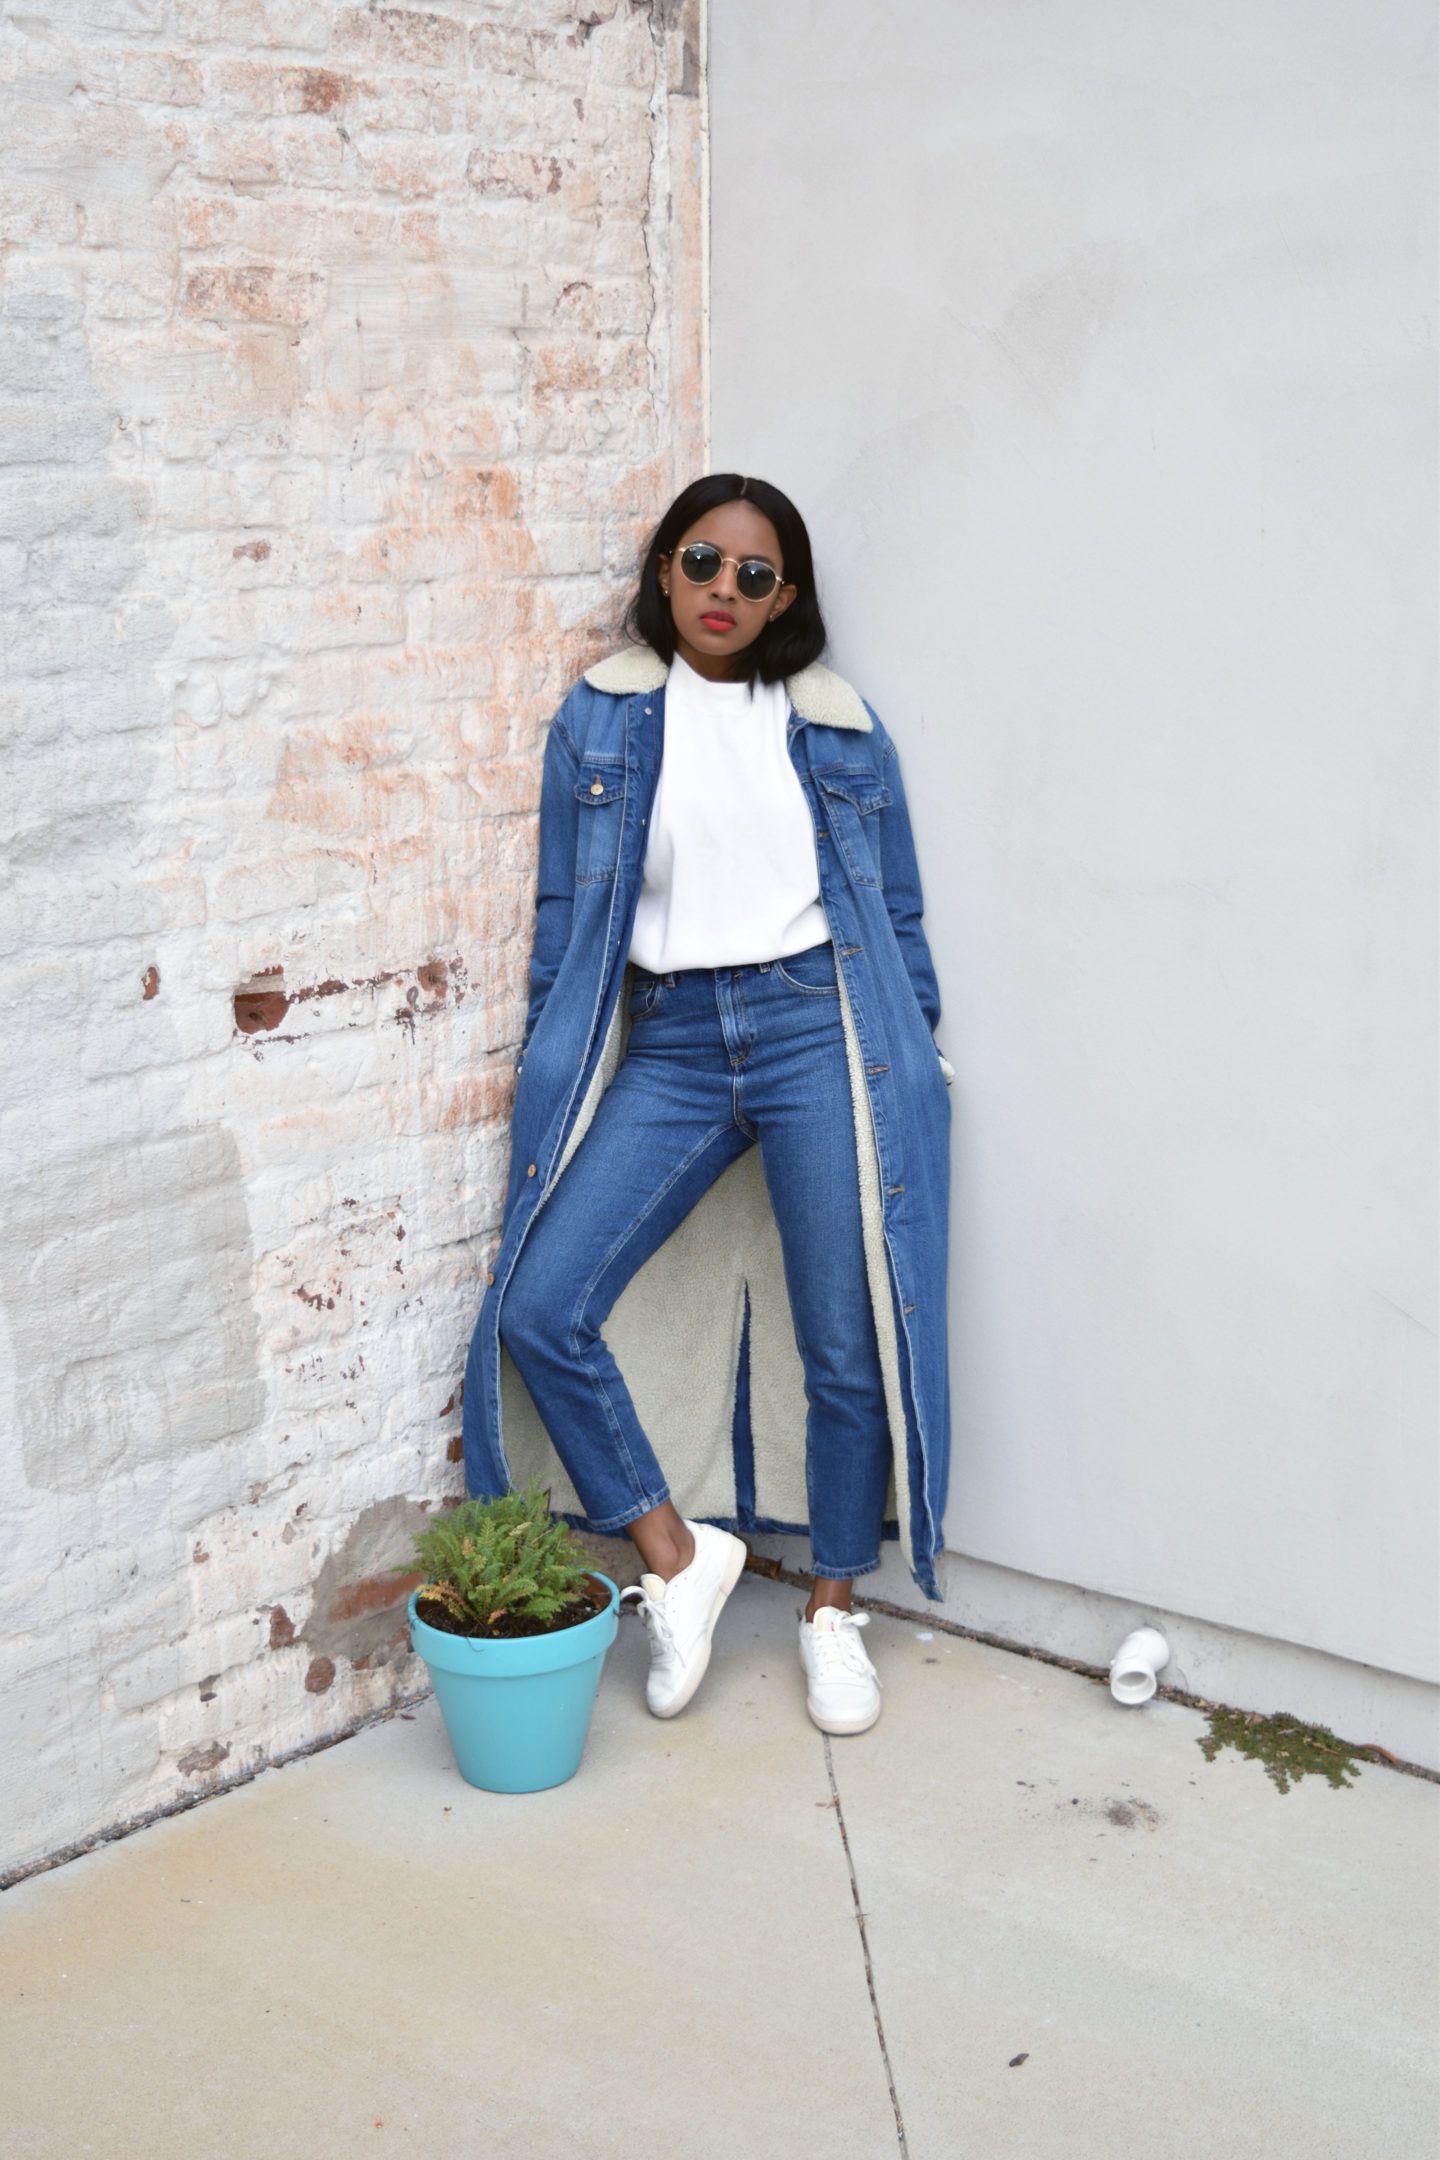 Canadian Tuxedo/ Denim on Denim   Zara Denim Sherpa Longline Jacket - Asos Farleigh Jeans - Reebok Club C 85 Vintage Sneakers